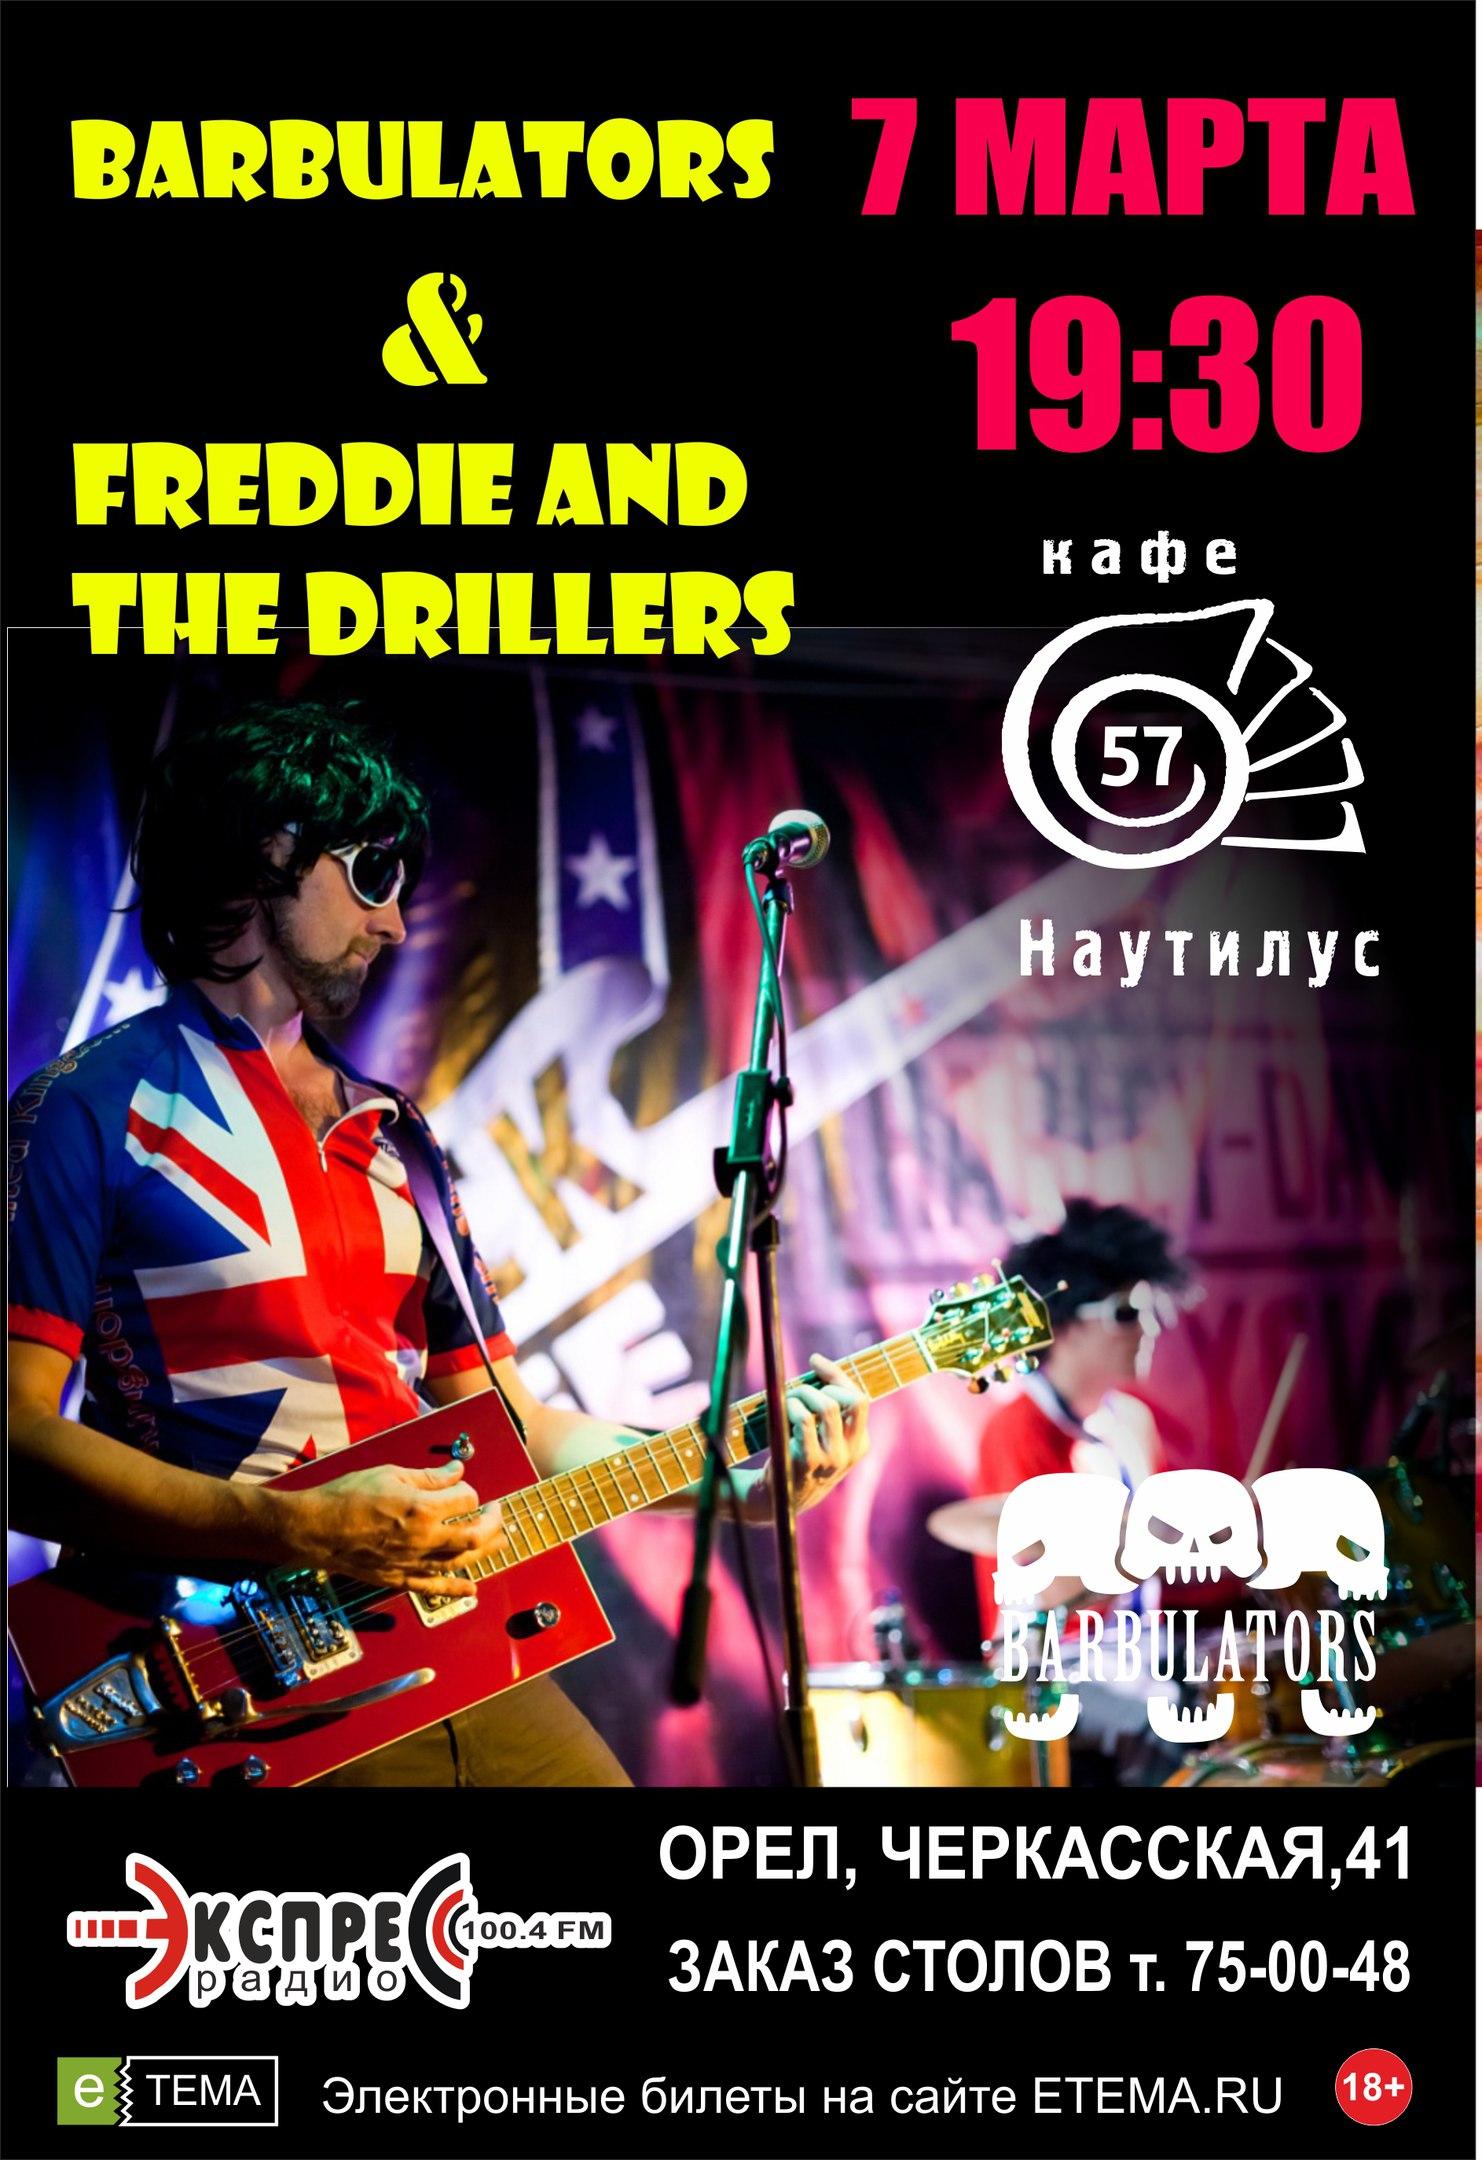 Freddie and the Drillers & BARBULATORS